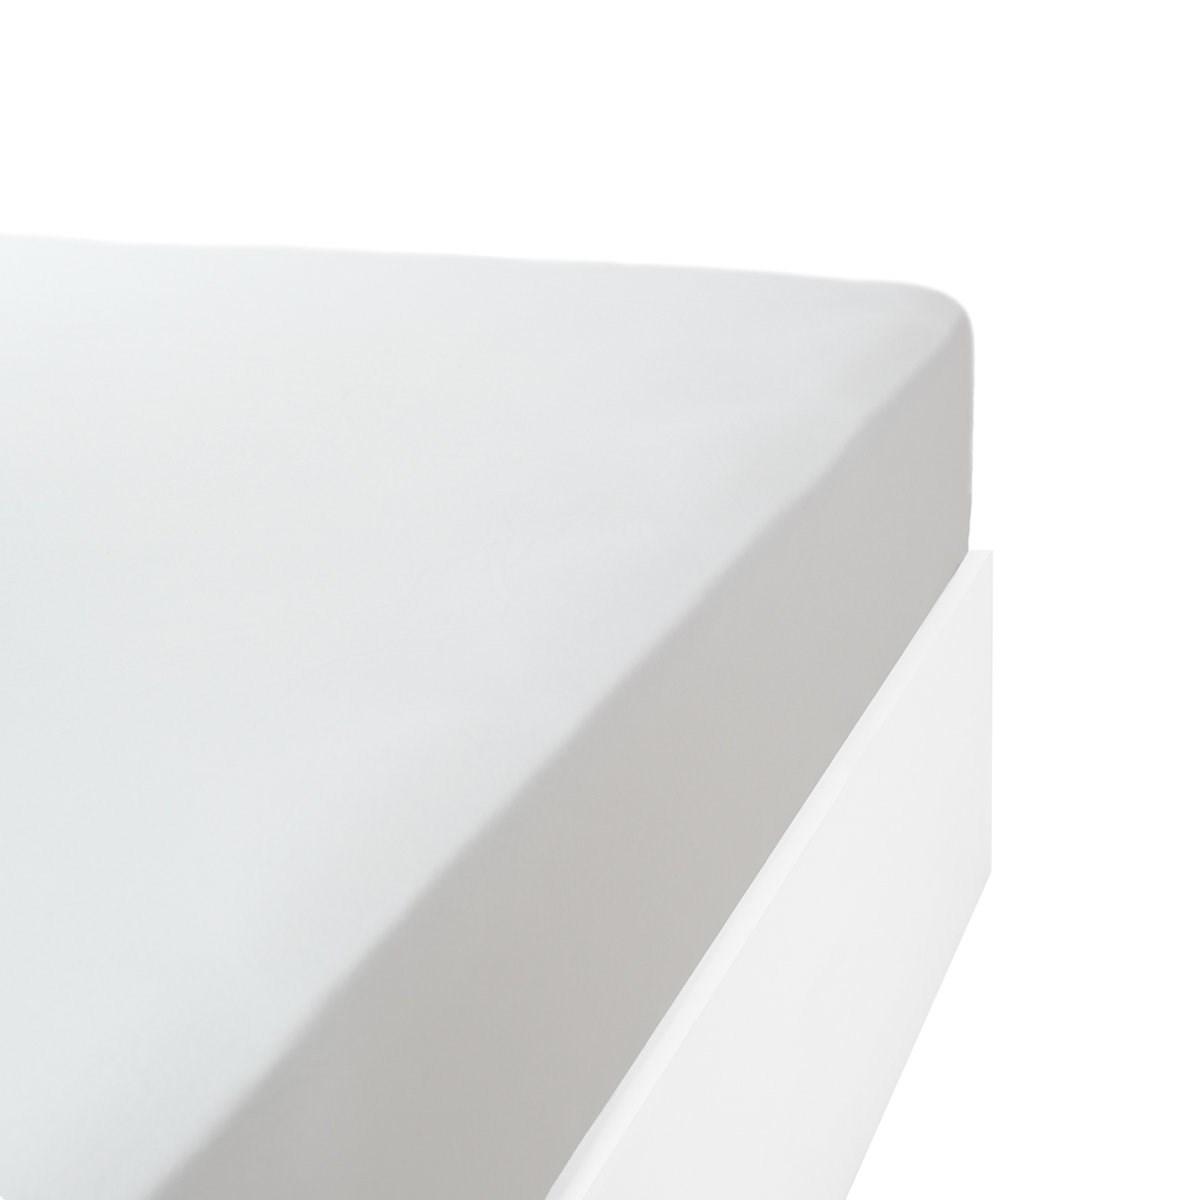 Drap housse jersey extensible en coton blanc 80x200 cm